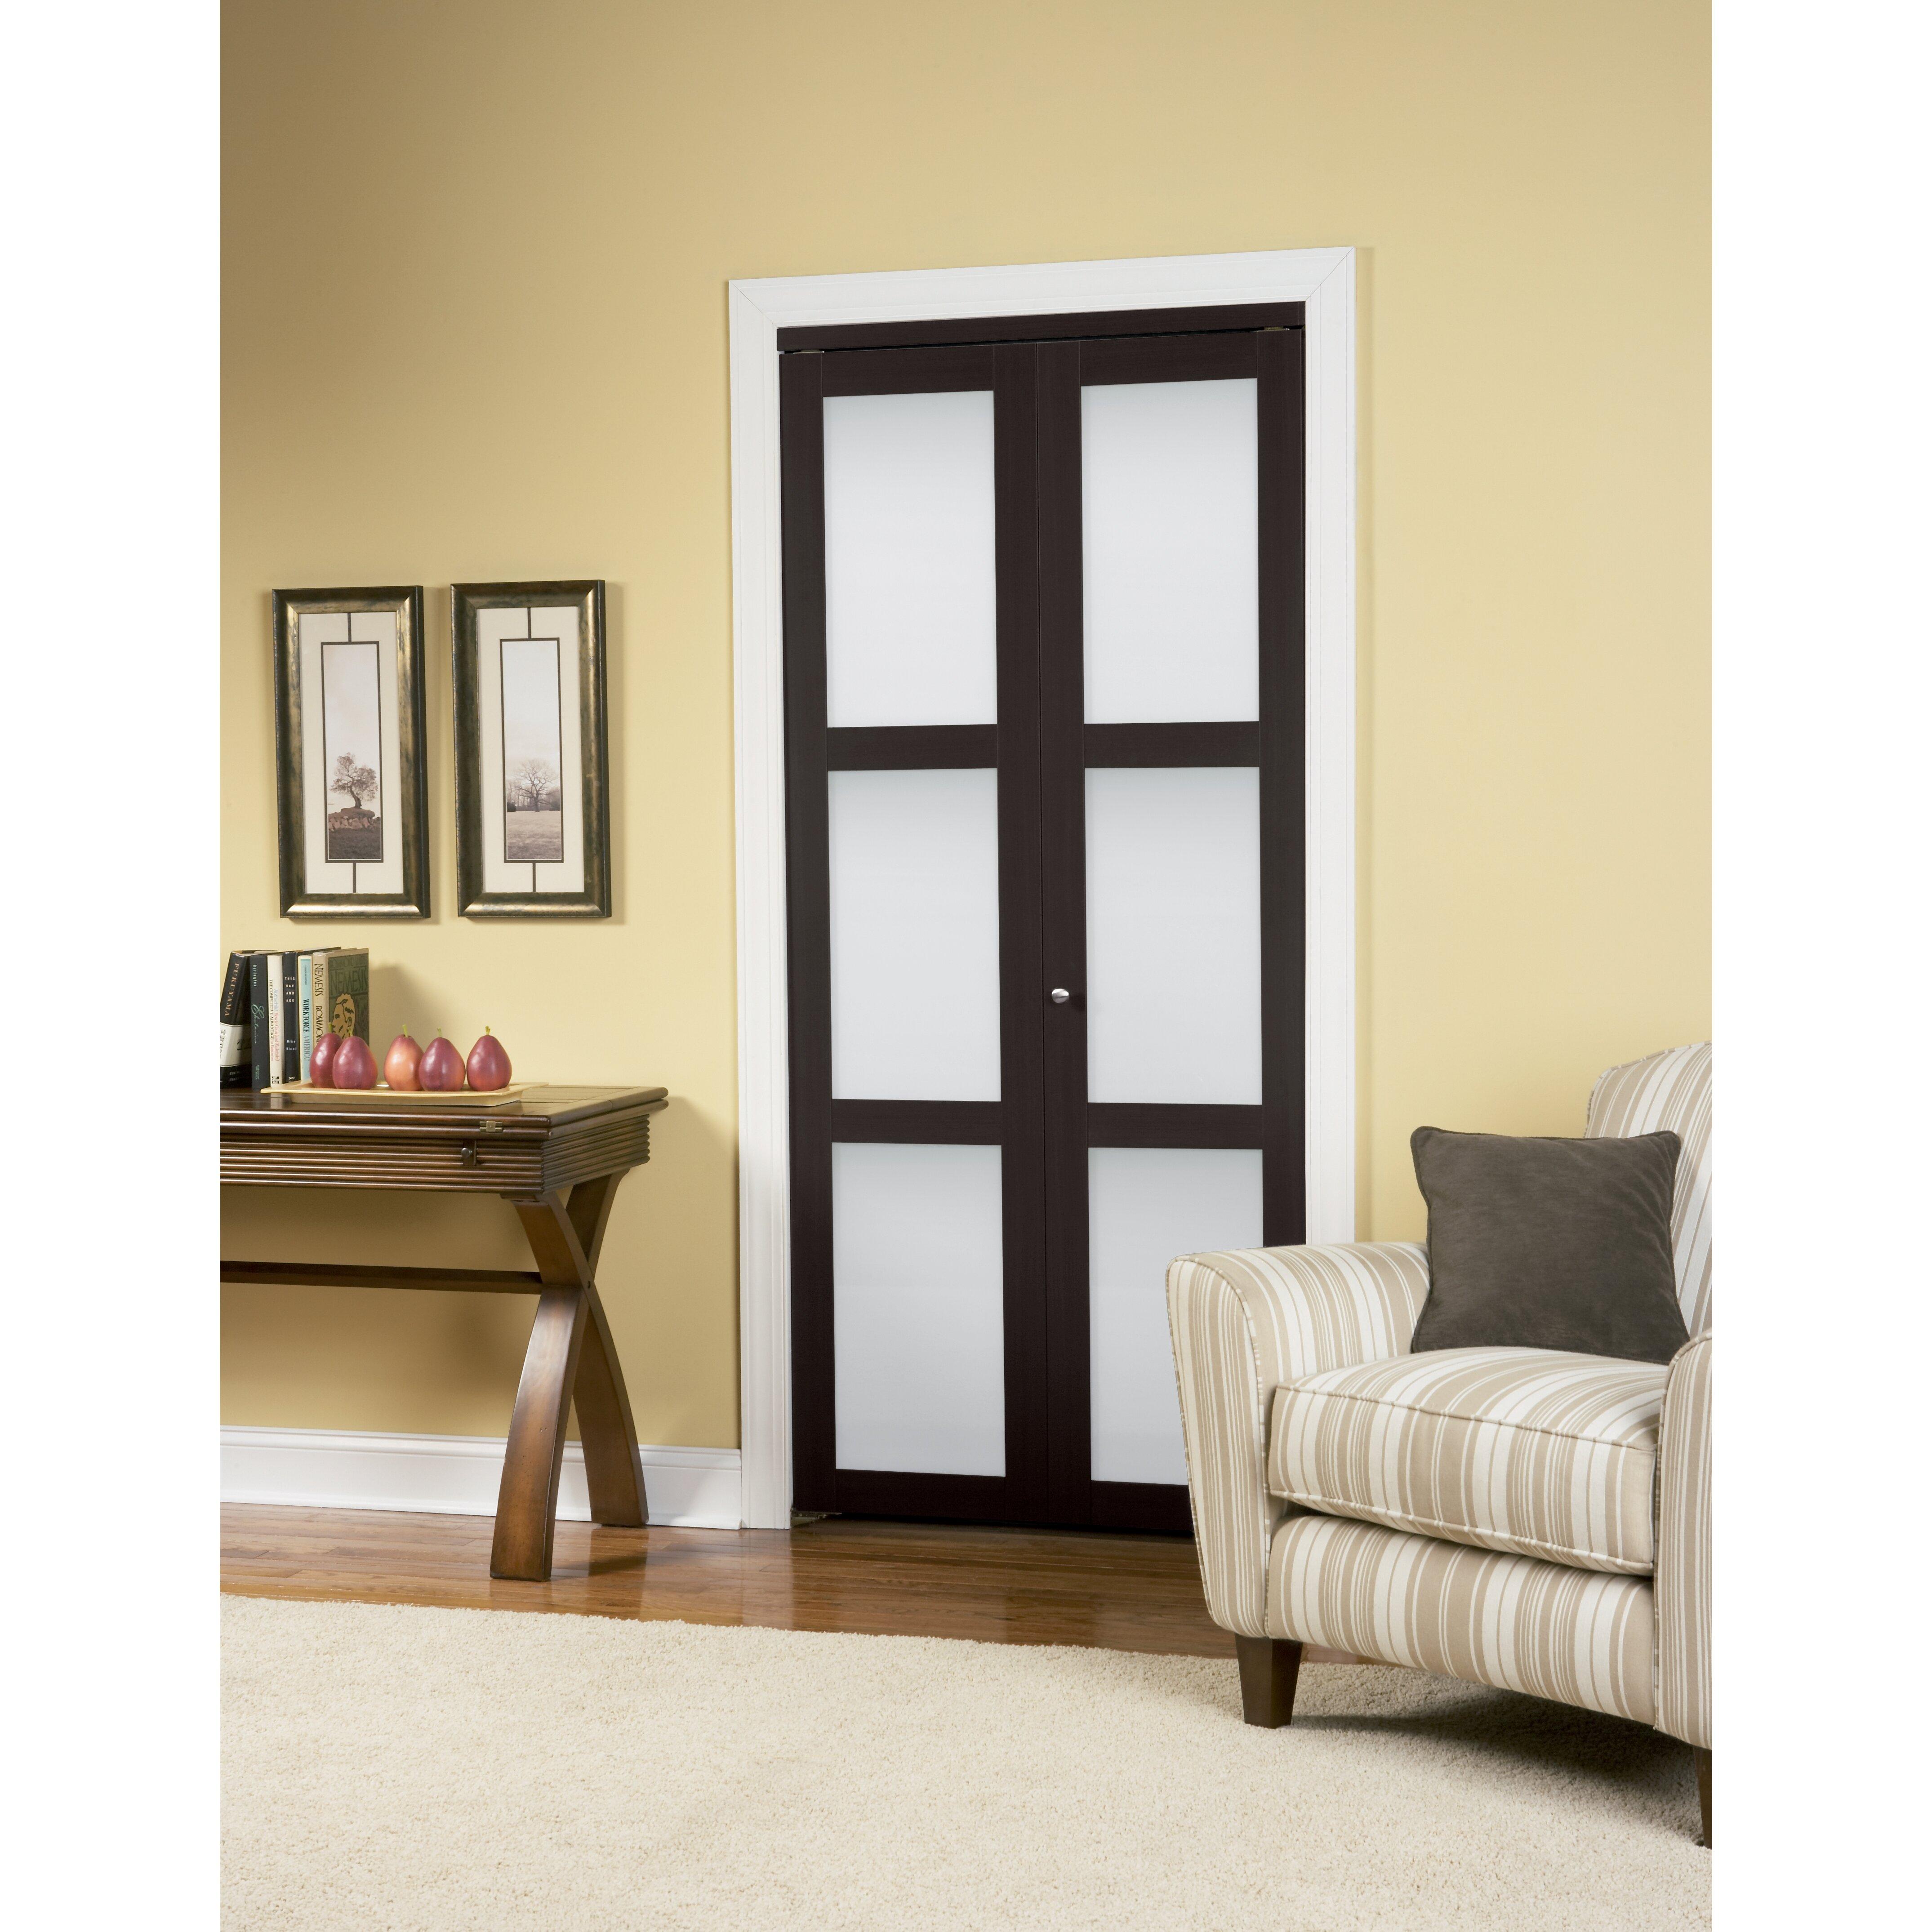 Mirror Bifold Doors 23 stylish closet door ideas that add style to your bedroom. find